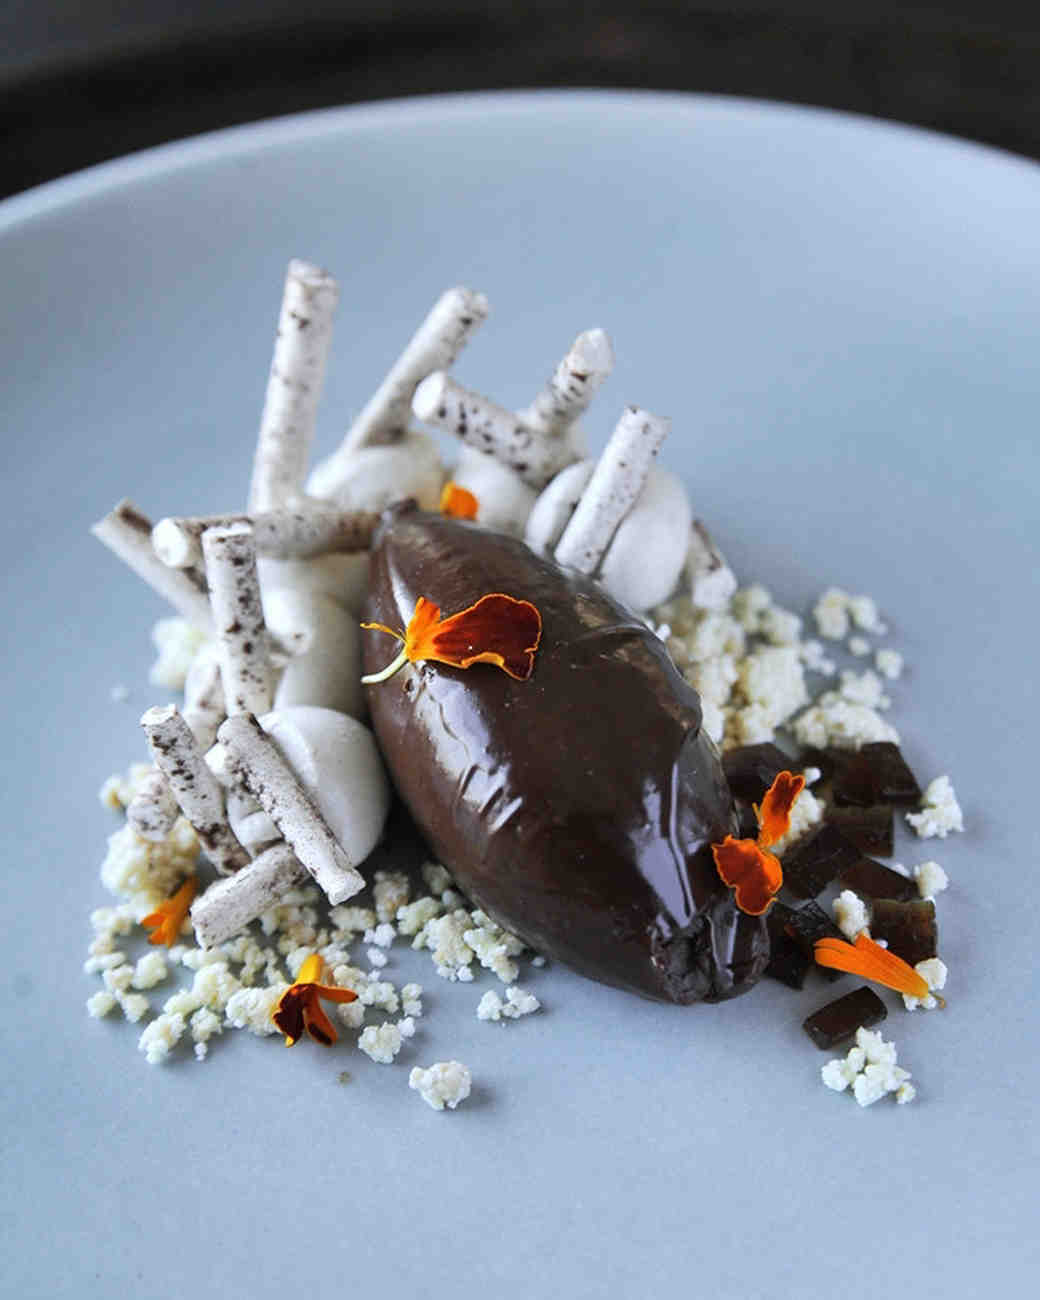 winter dessert chocolate cremeux cardamom coffee meringue